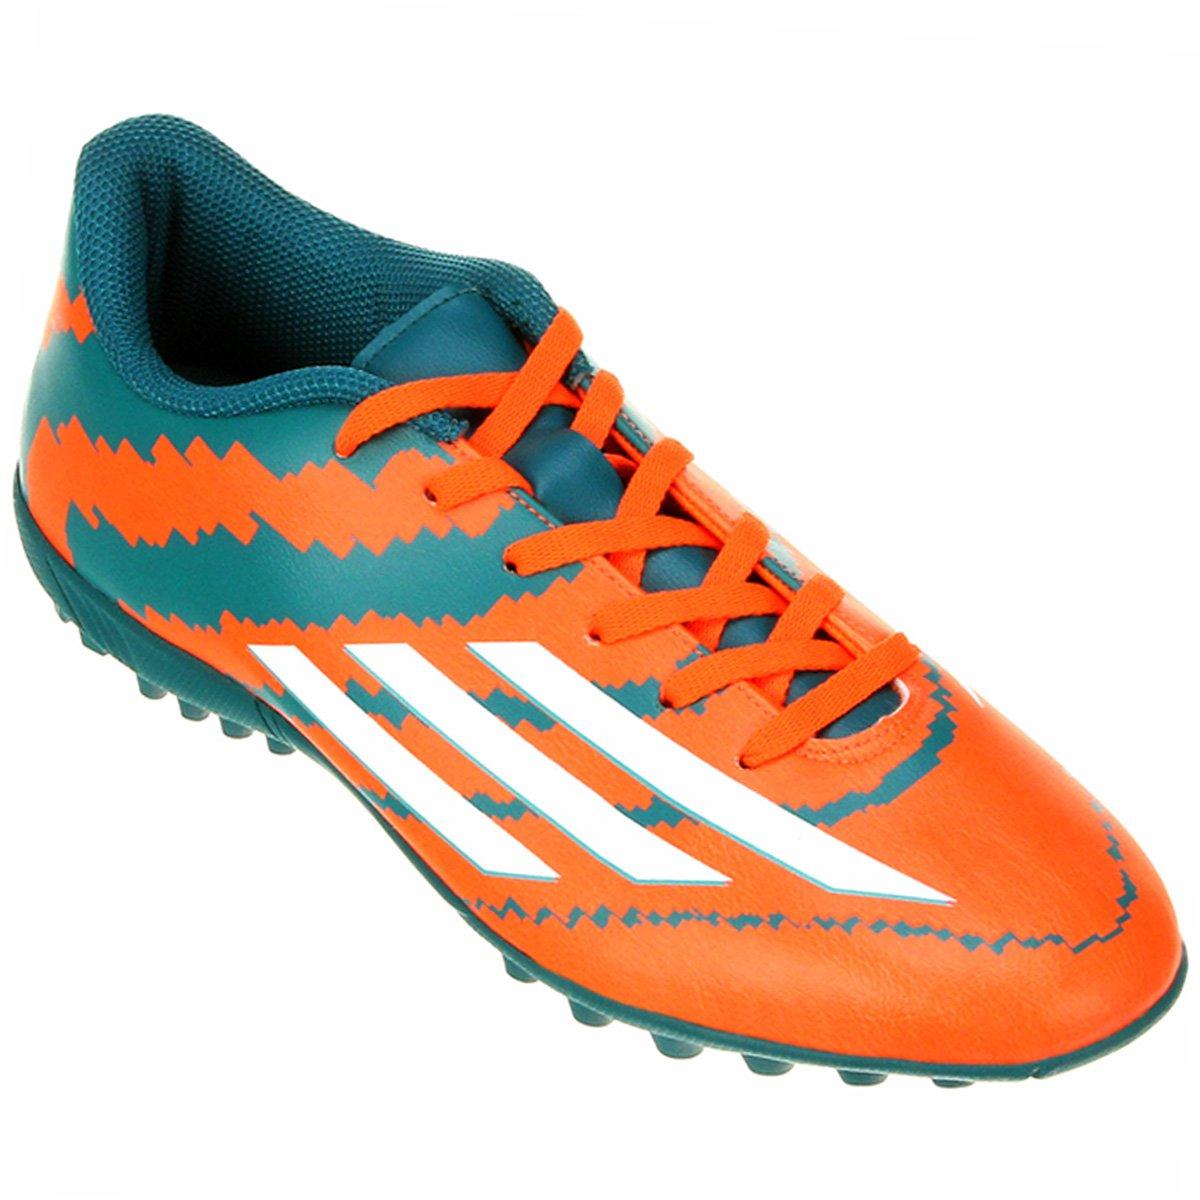 Chuteira Adidas F5 TF Society Messi - Compre Agora  4be246a5bedb9